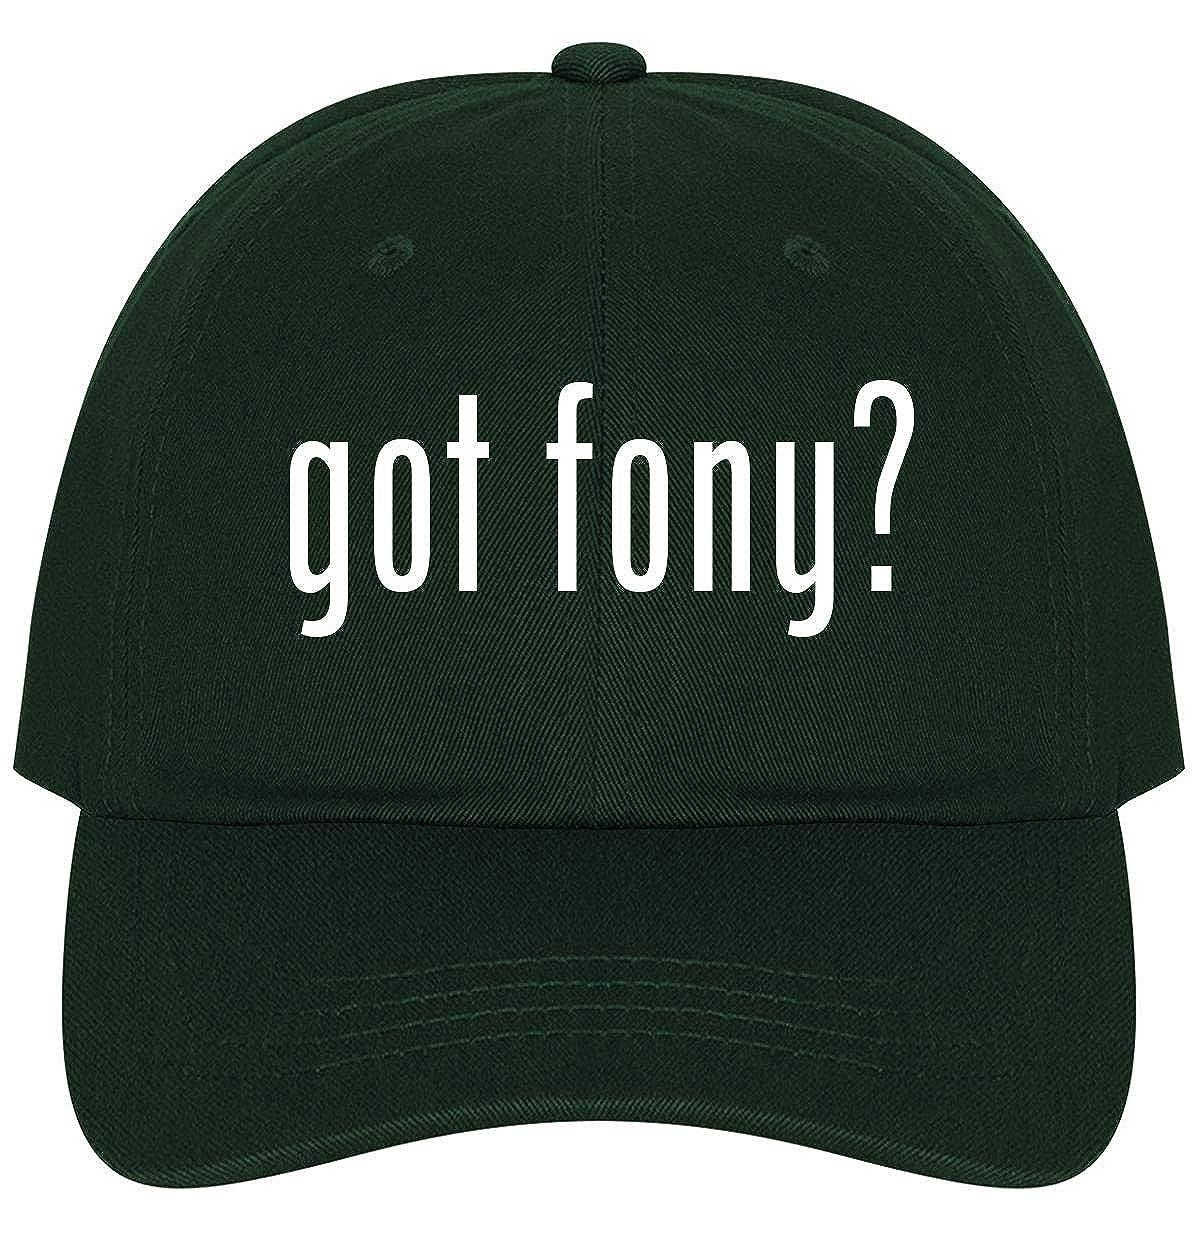 got Fony? - A Nice Comfortable Adjustable Dad Hat Cap